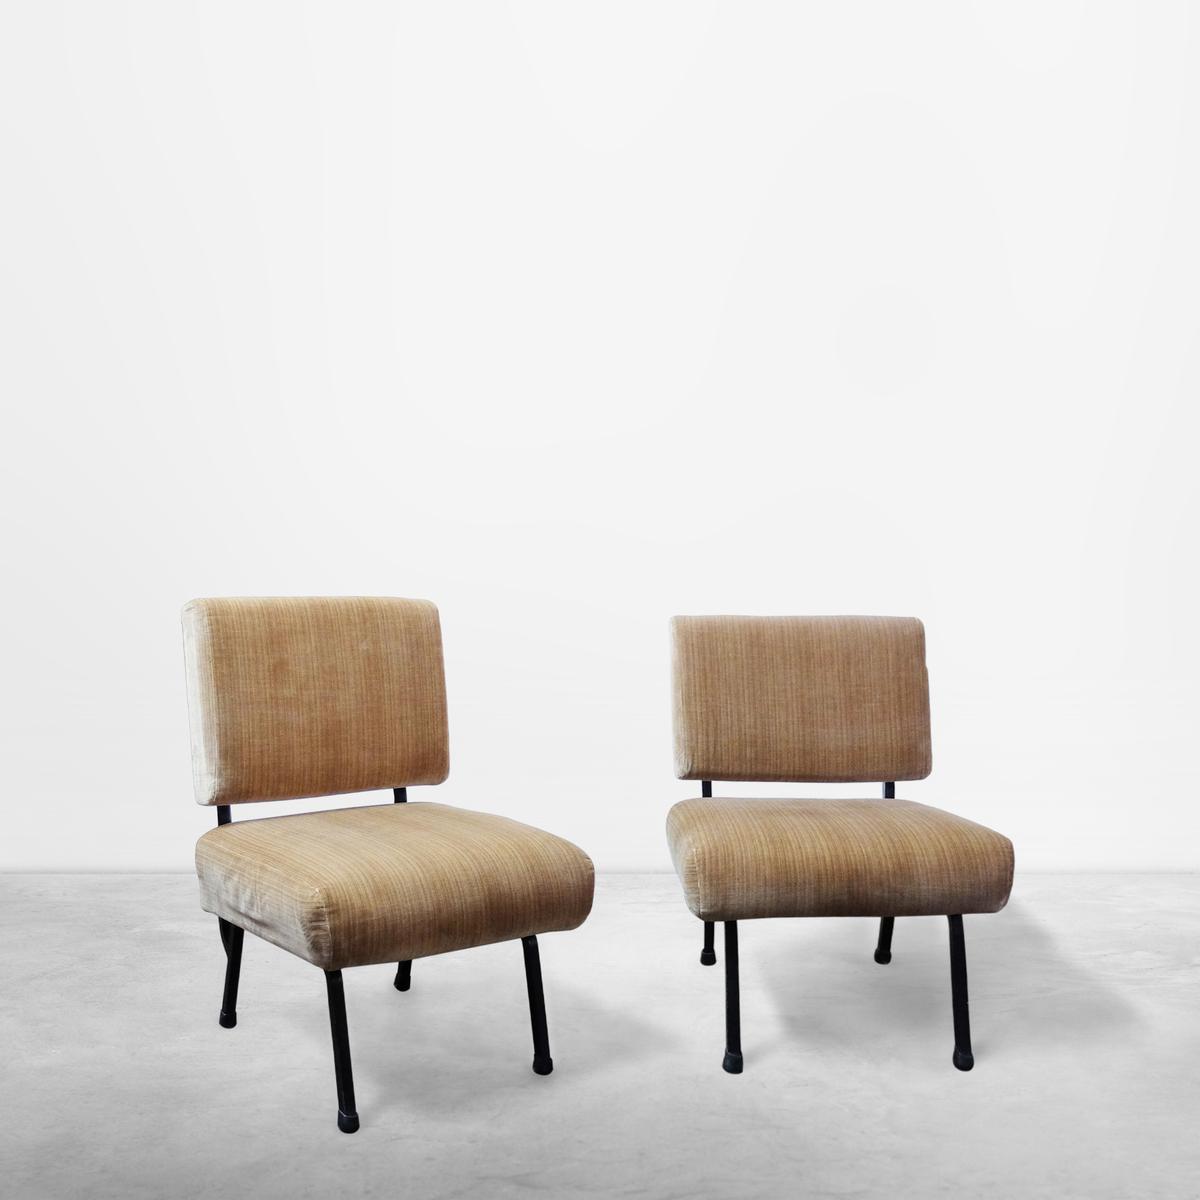 Pair of Italian Mid-Century Modernist Armchairs, in Soft Velvet Fabric, 1950s